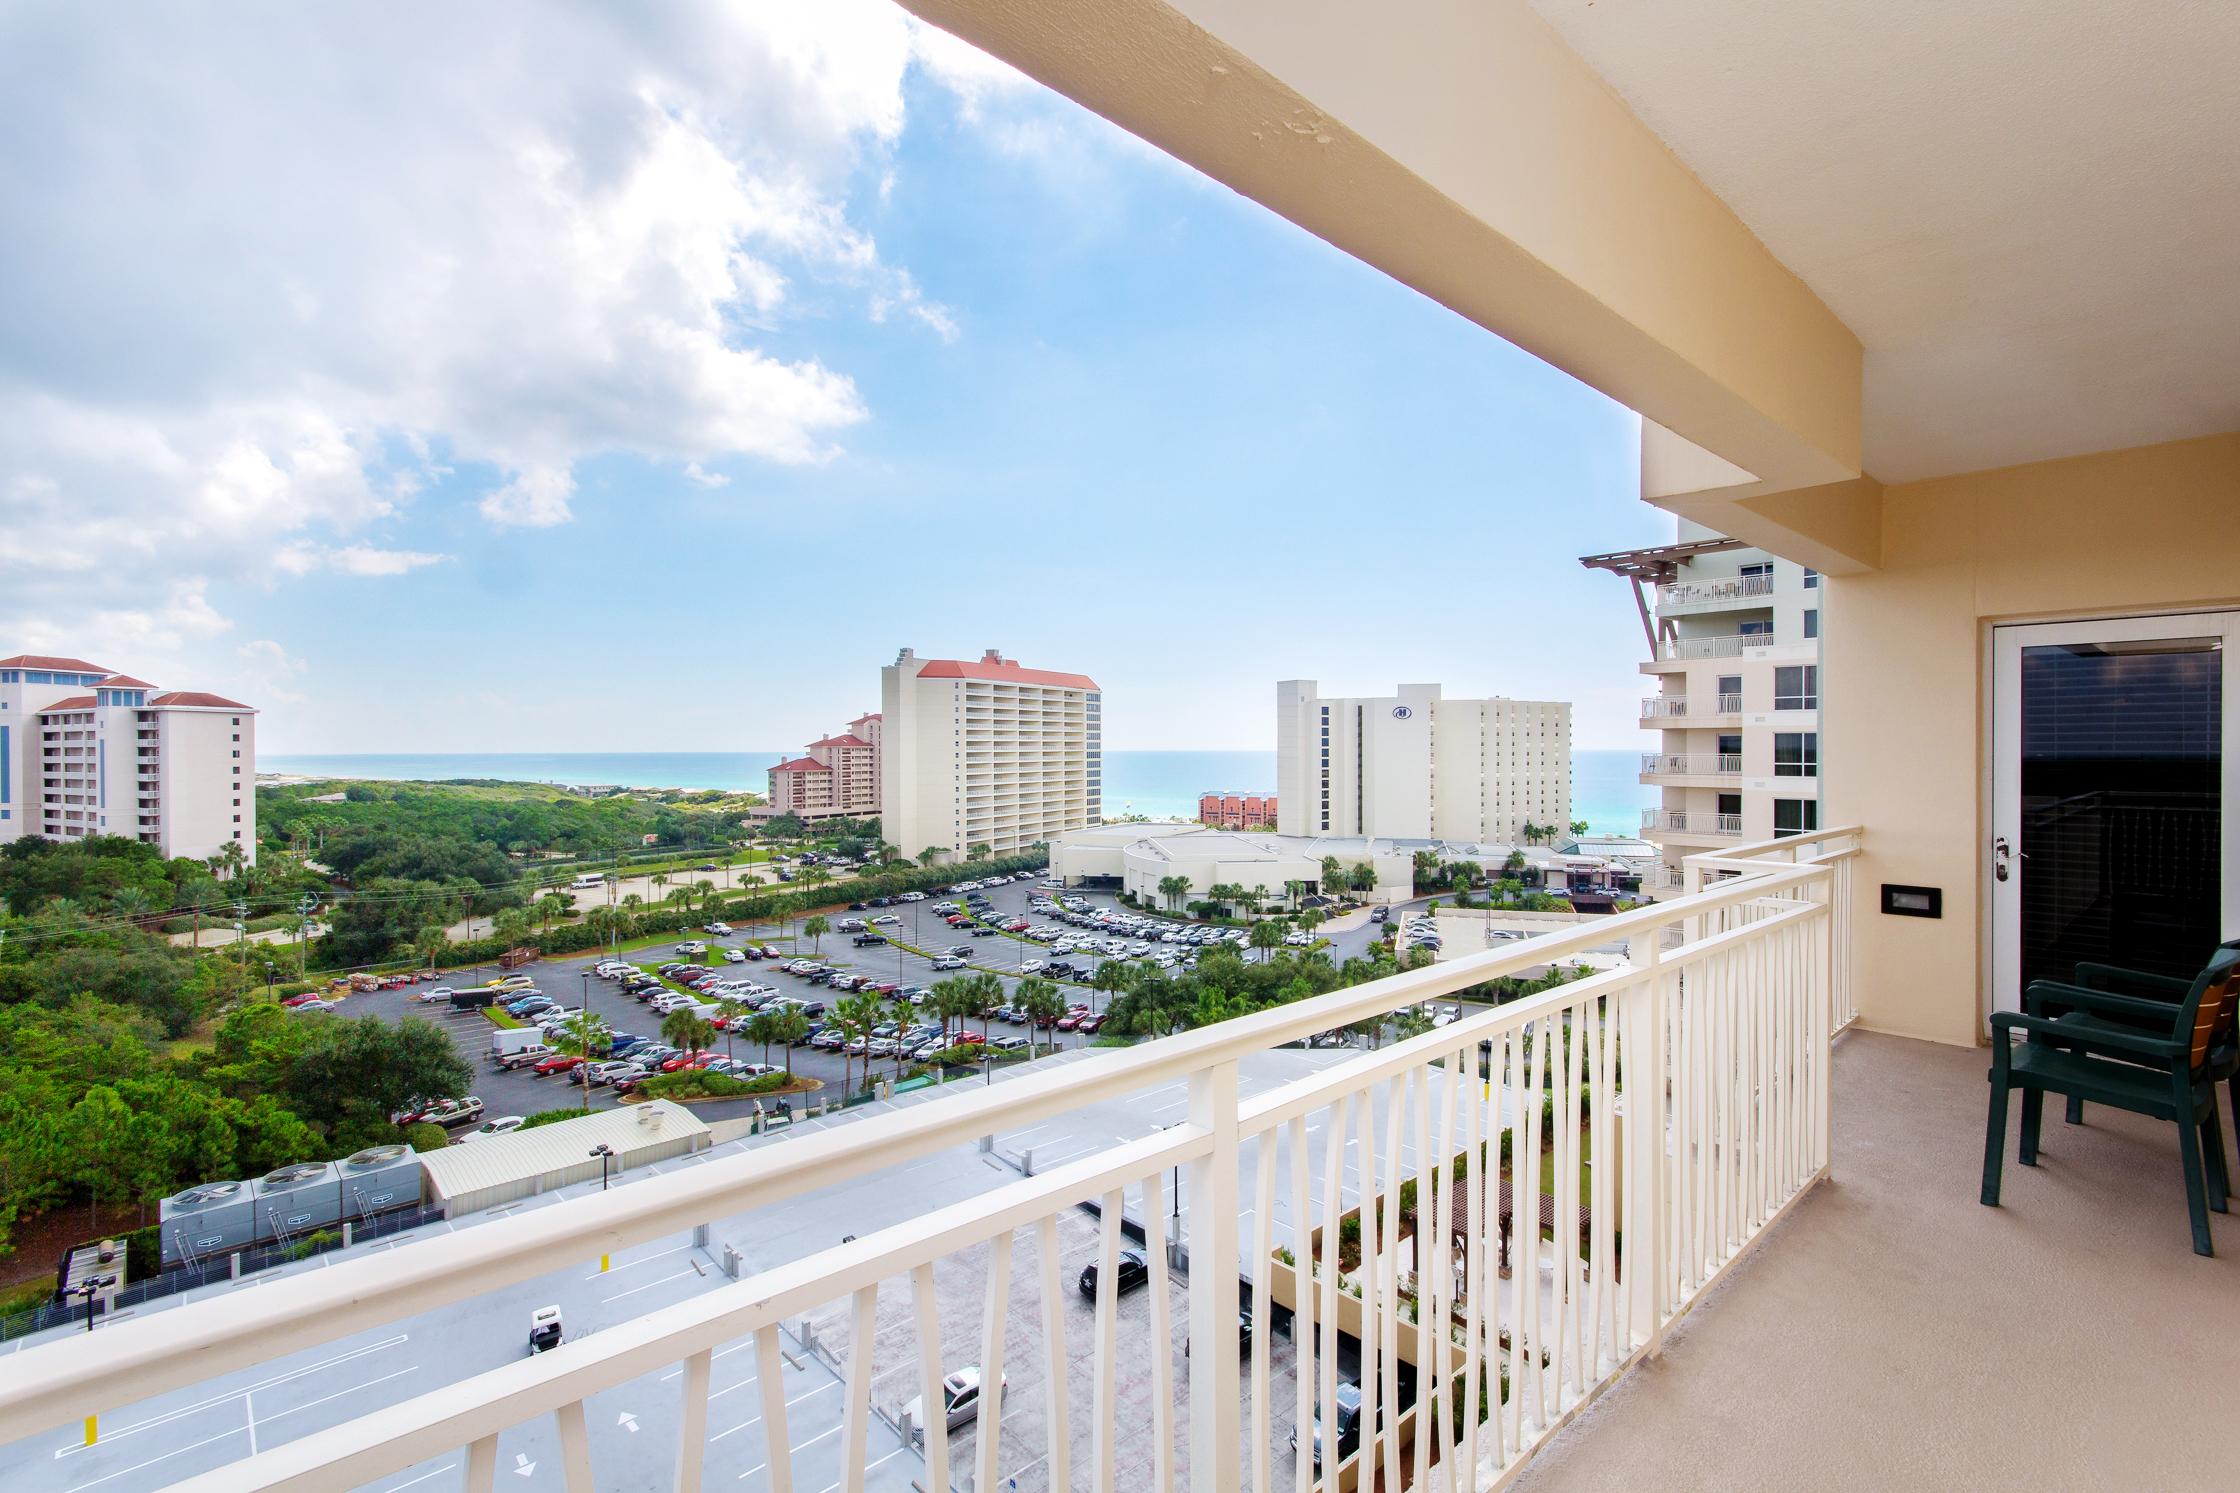 Miramar Beach FL Vacation Rental Welcome to Miramar